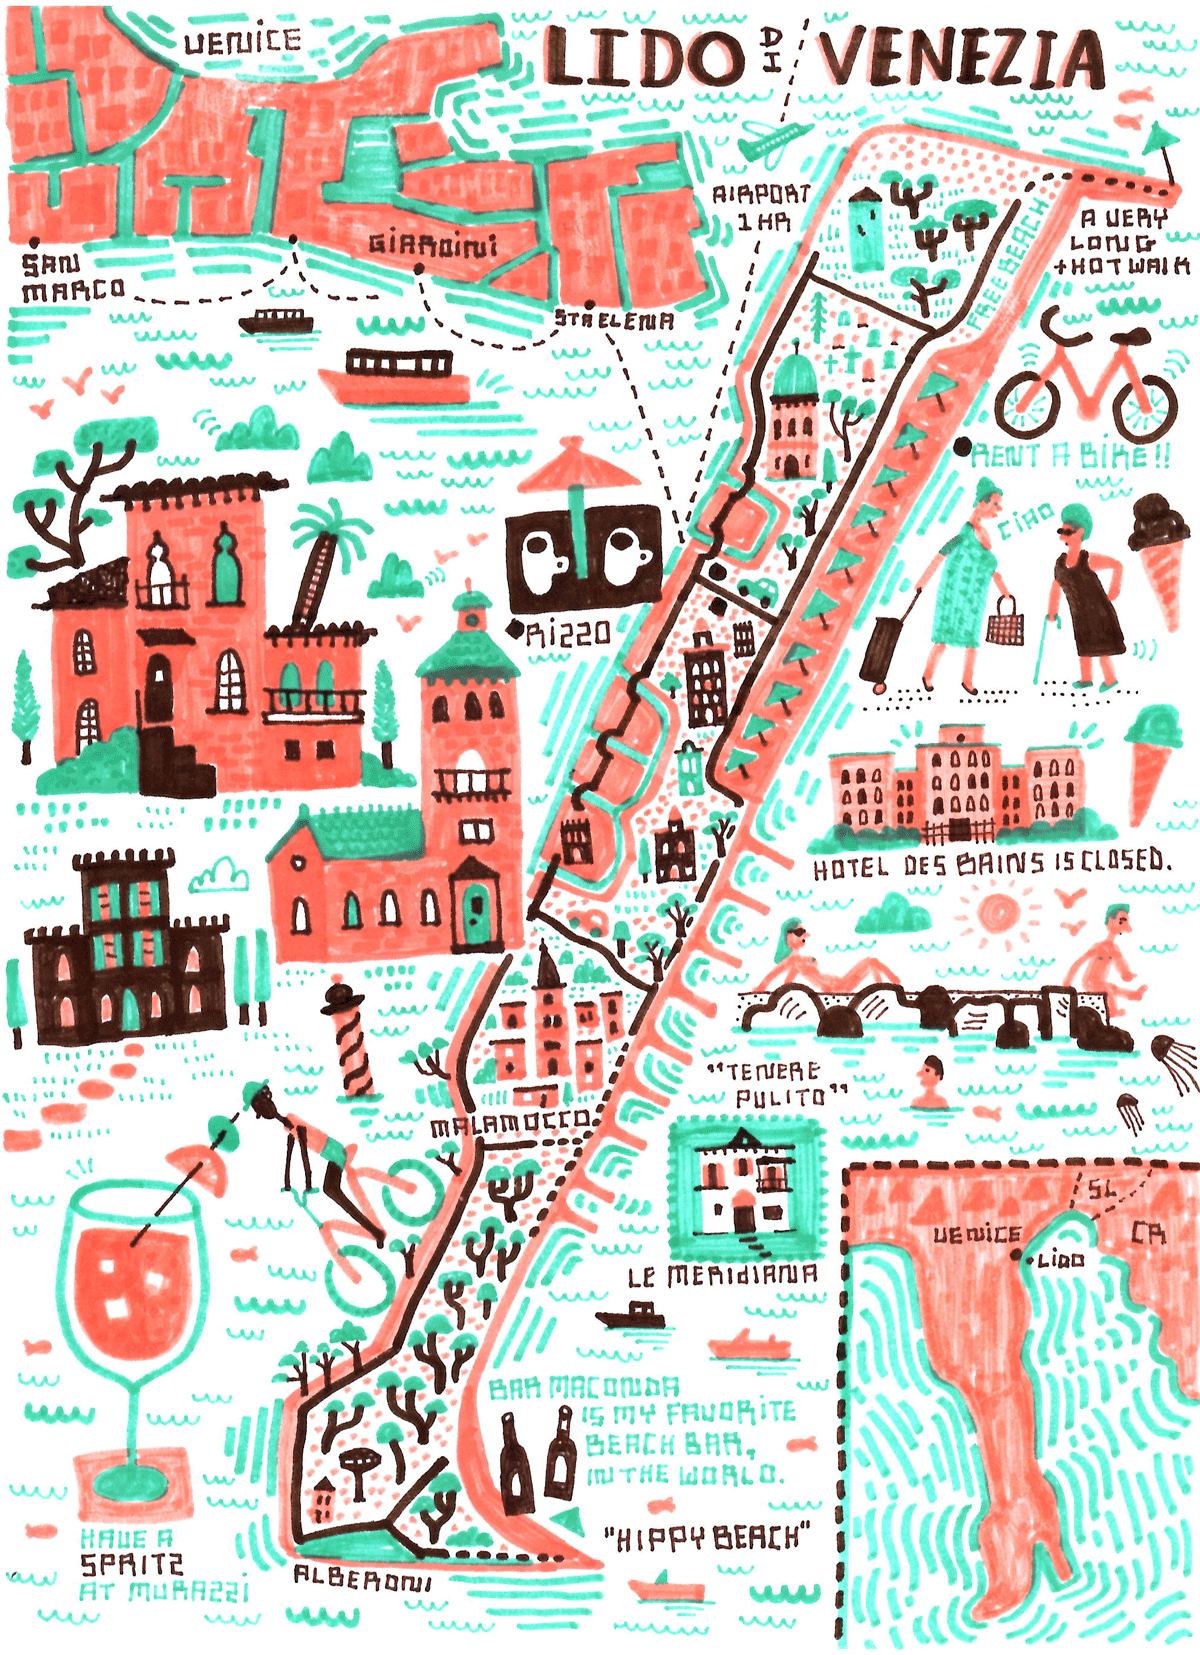 My Sketchbook - Map location: Lido di Venezia, Italy